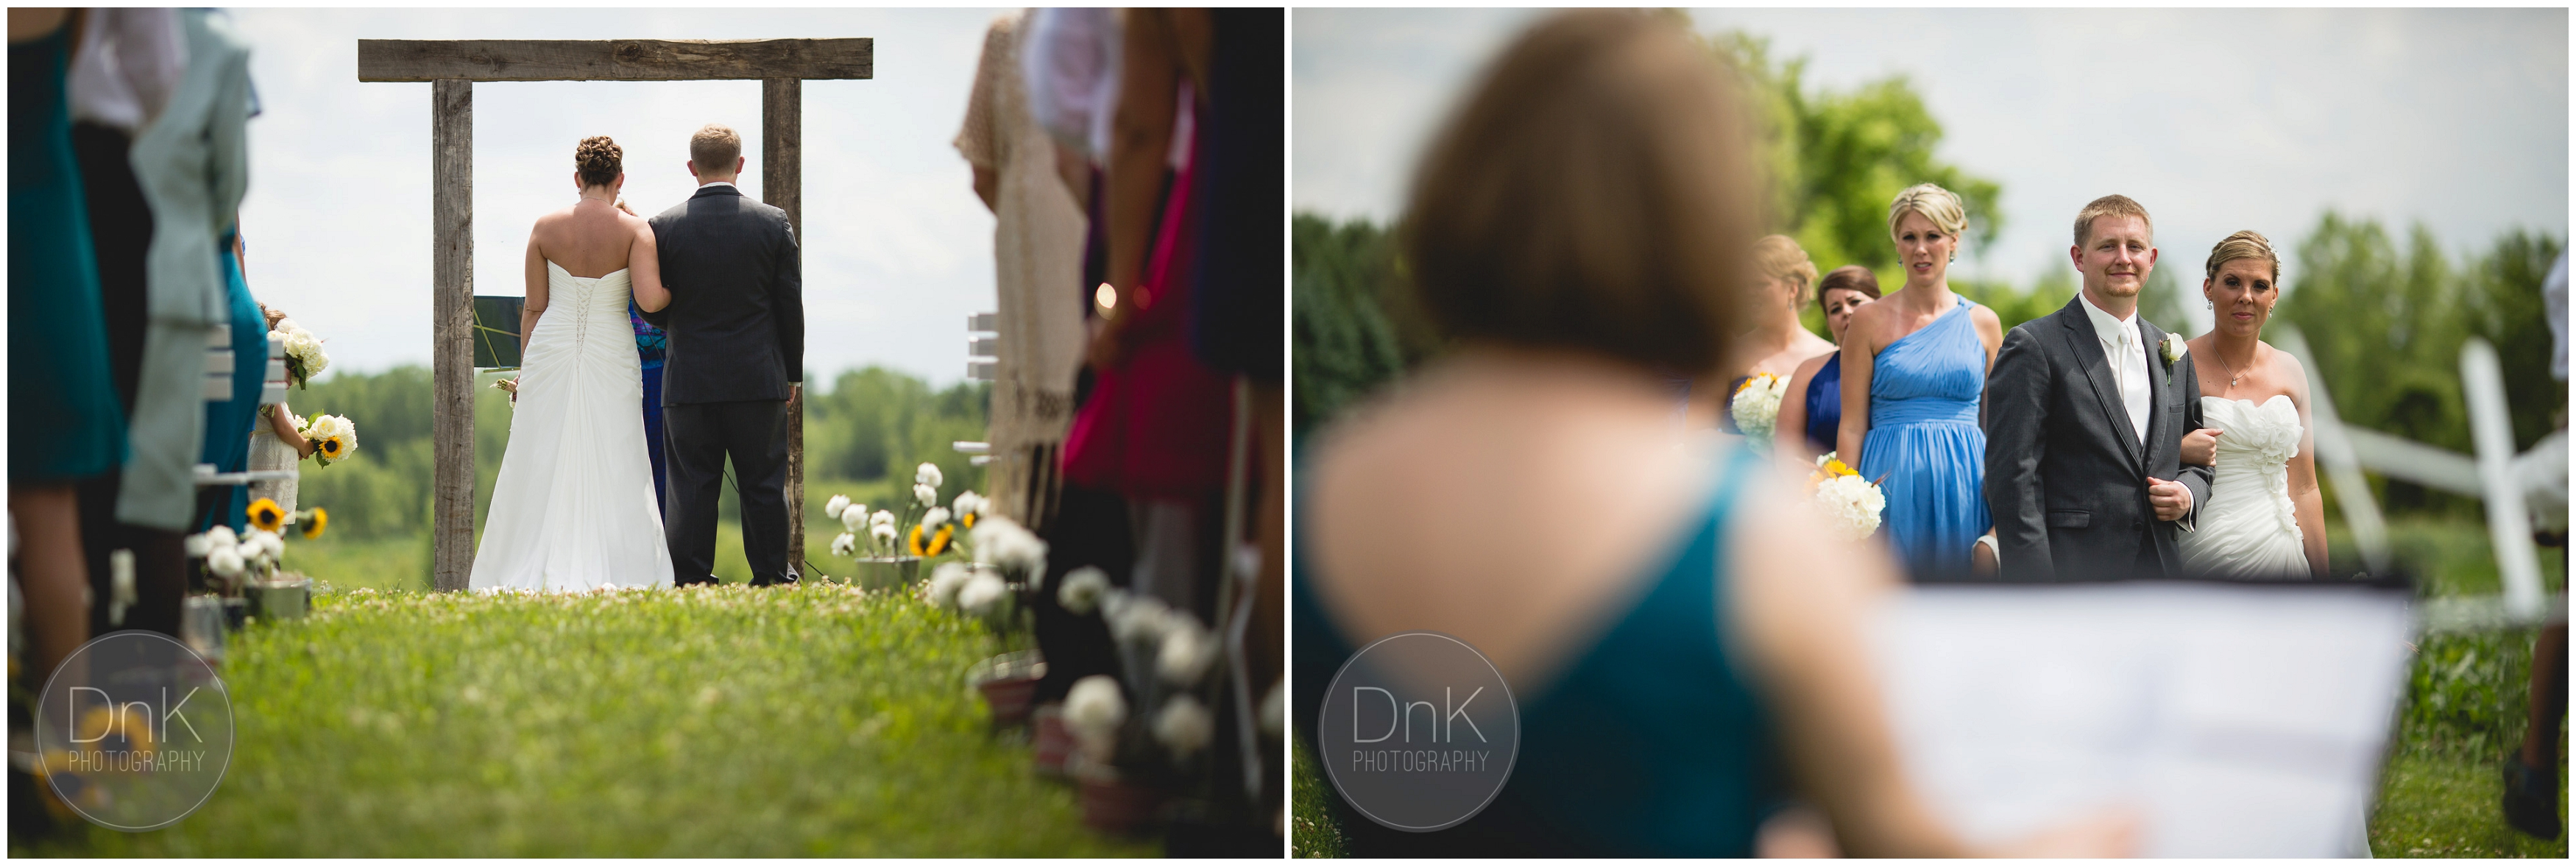 19- Outdoor Wedding Ceremony Dellwood Barn